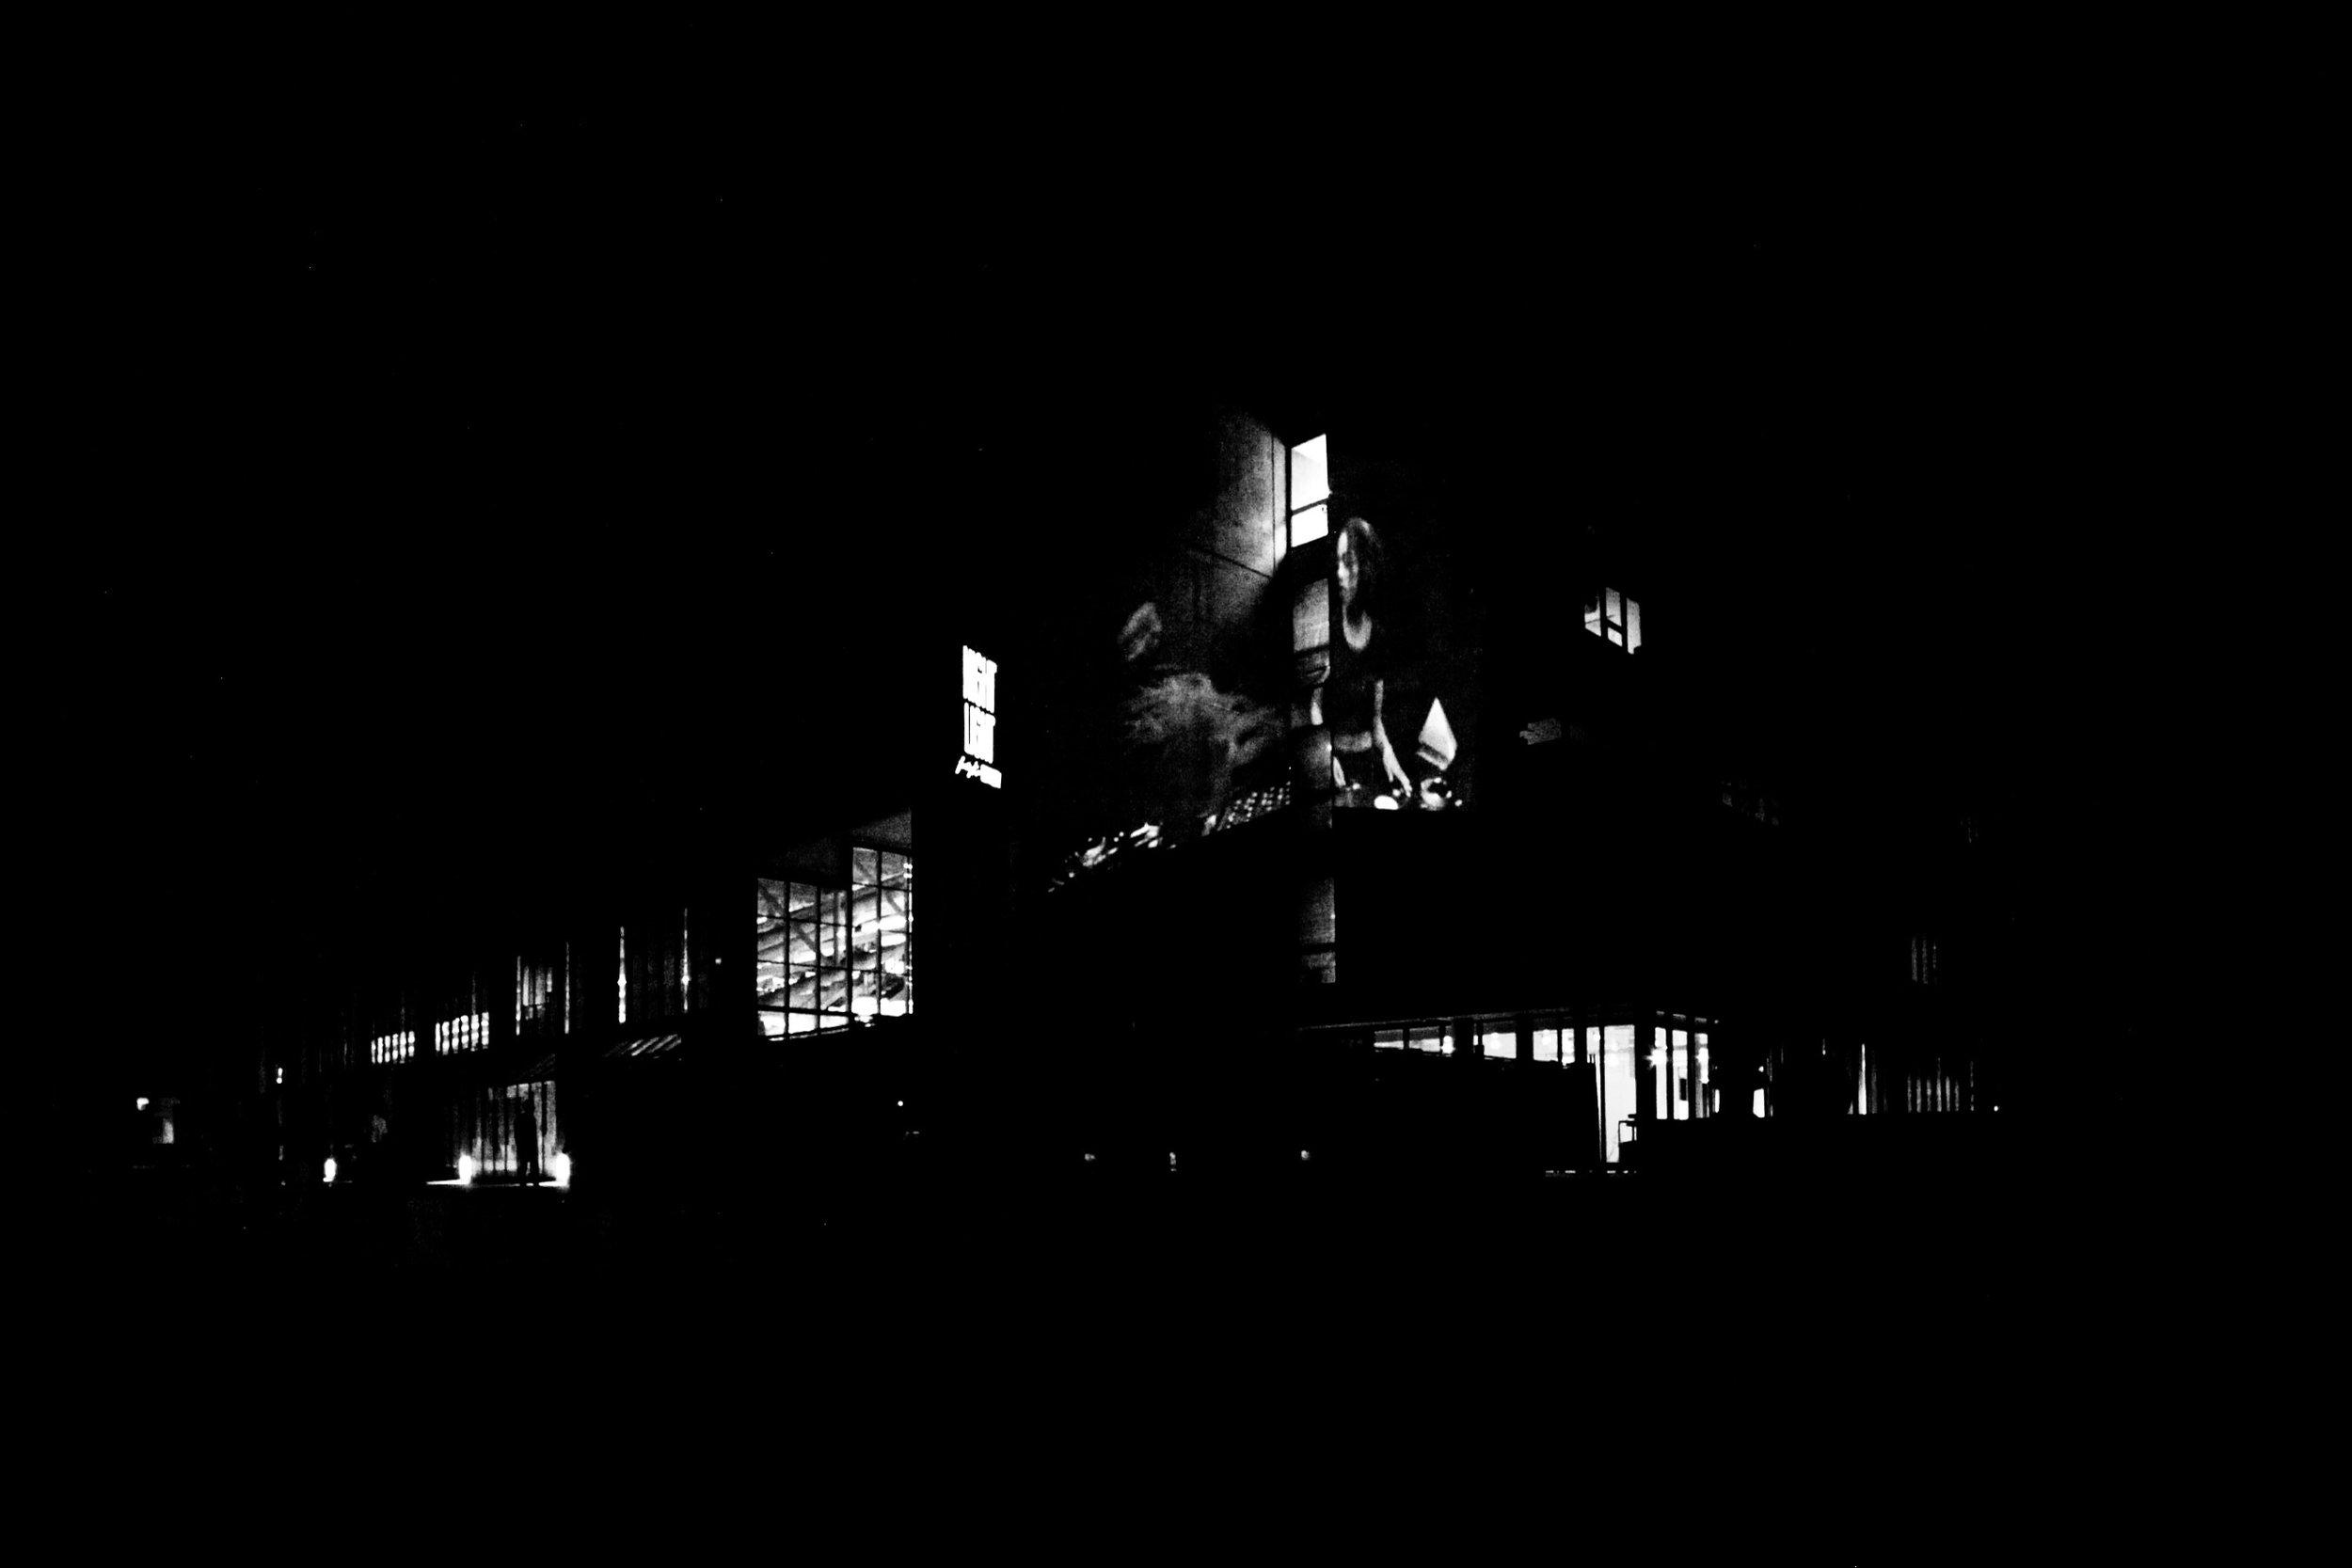 NIGHT-LIGHT_Session1-243-squashed.jpg